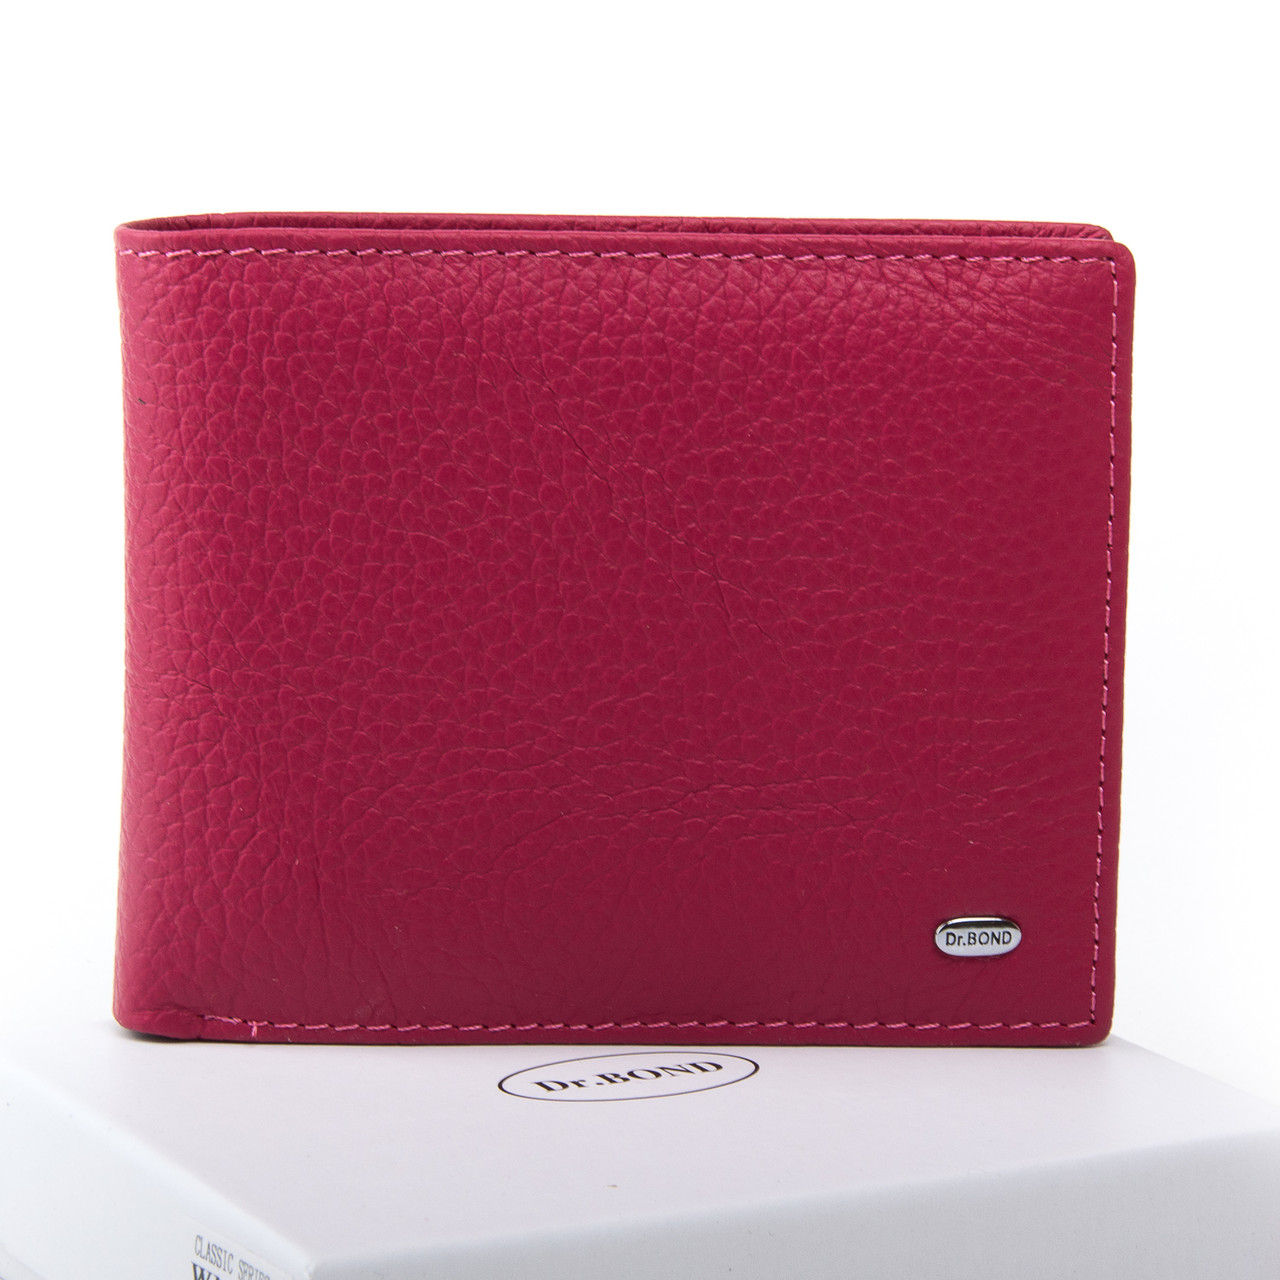 Жеснкий кошелек Classic кожа DR. BOND WN-7 розовый